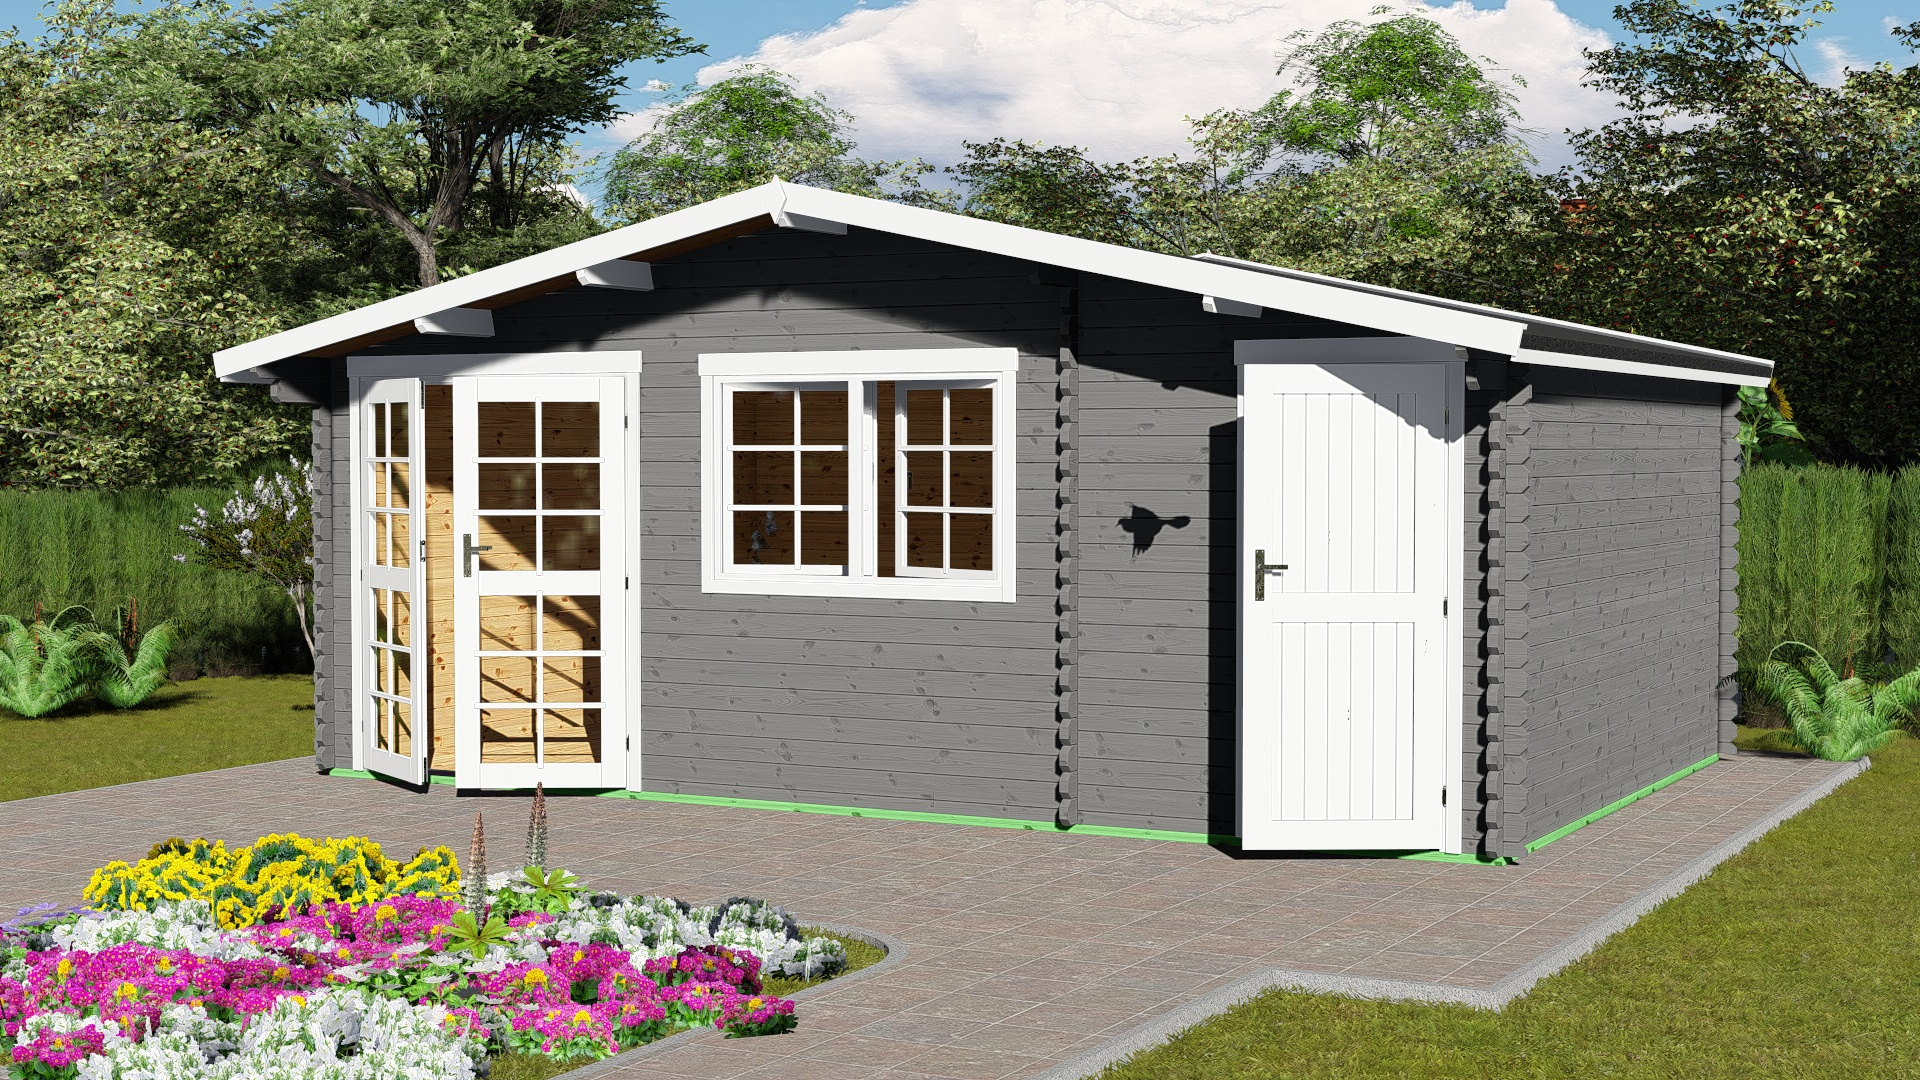 Gartenhaus mit Anbau 40 mm NWH Mosel 40061